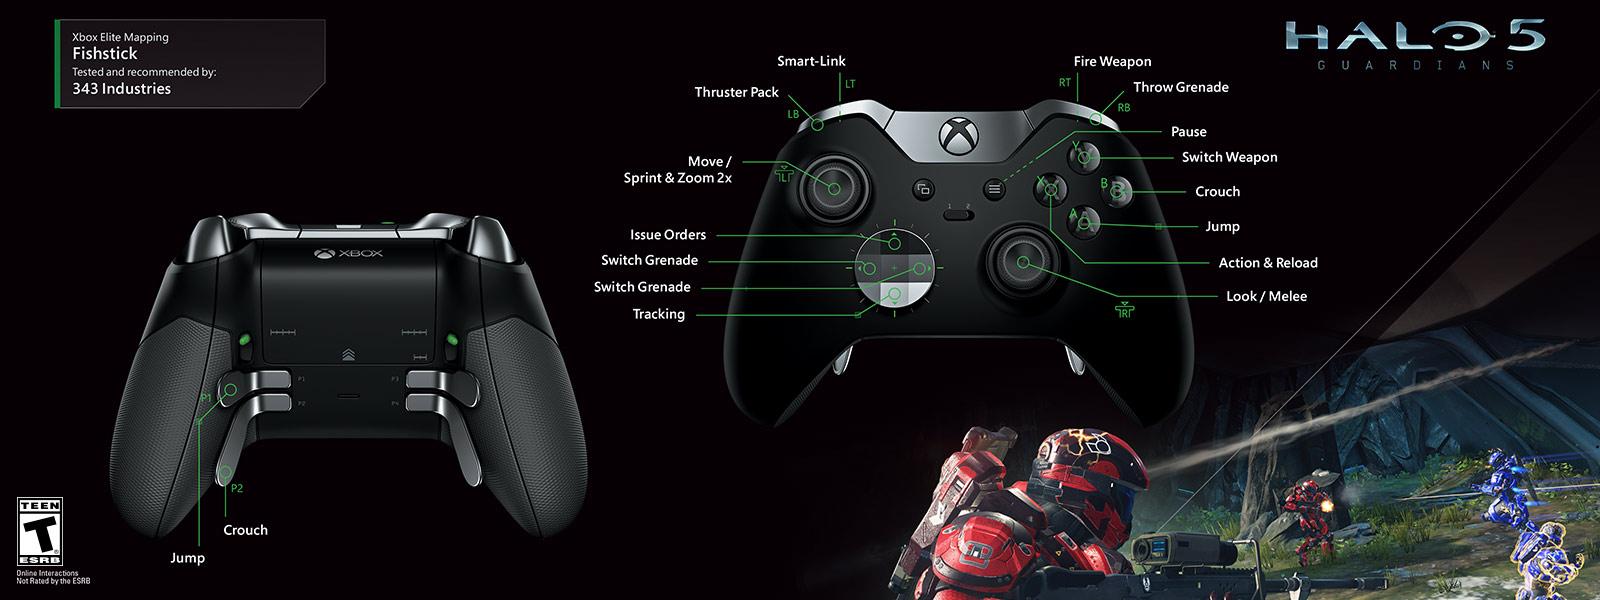 ... Halo 5 – Fishstick Elite Mapping ...